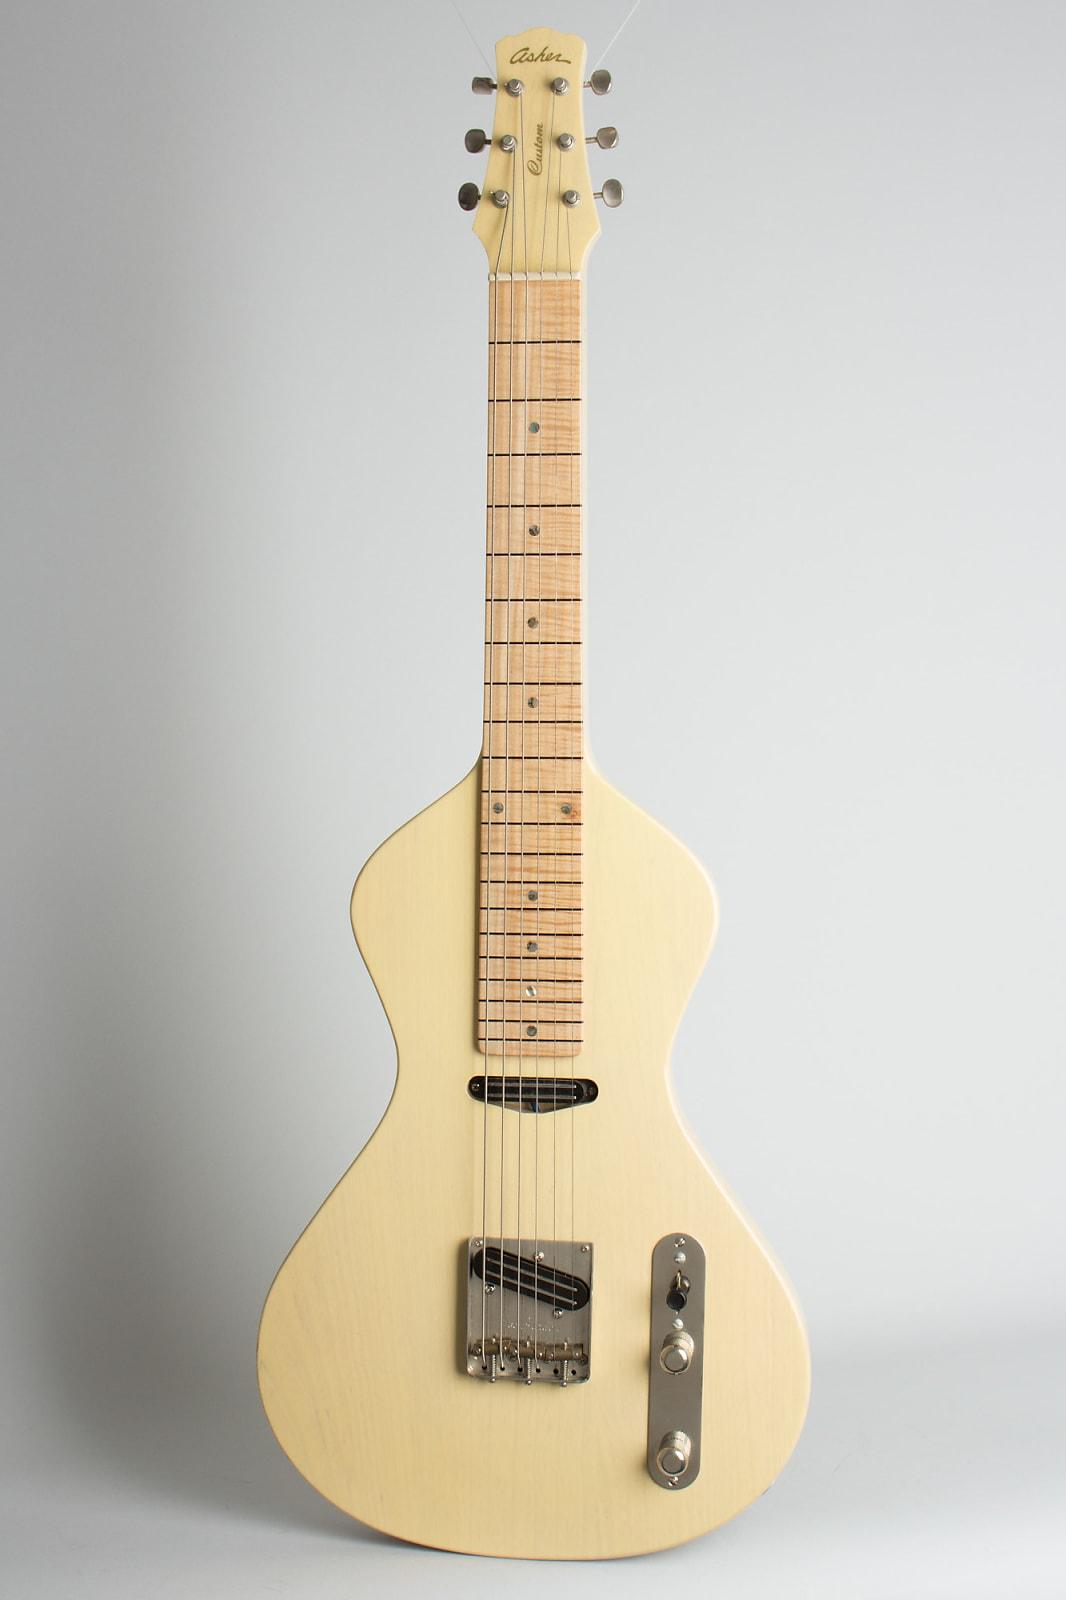 Asher  Custom Slidecaster T Lap Steel Electric Guitar (2007), ser. #335, original black tolex hard shell case.